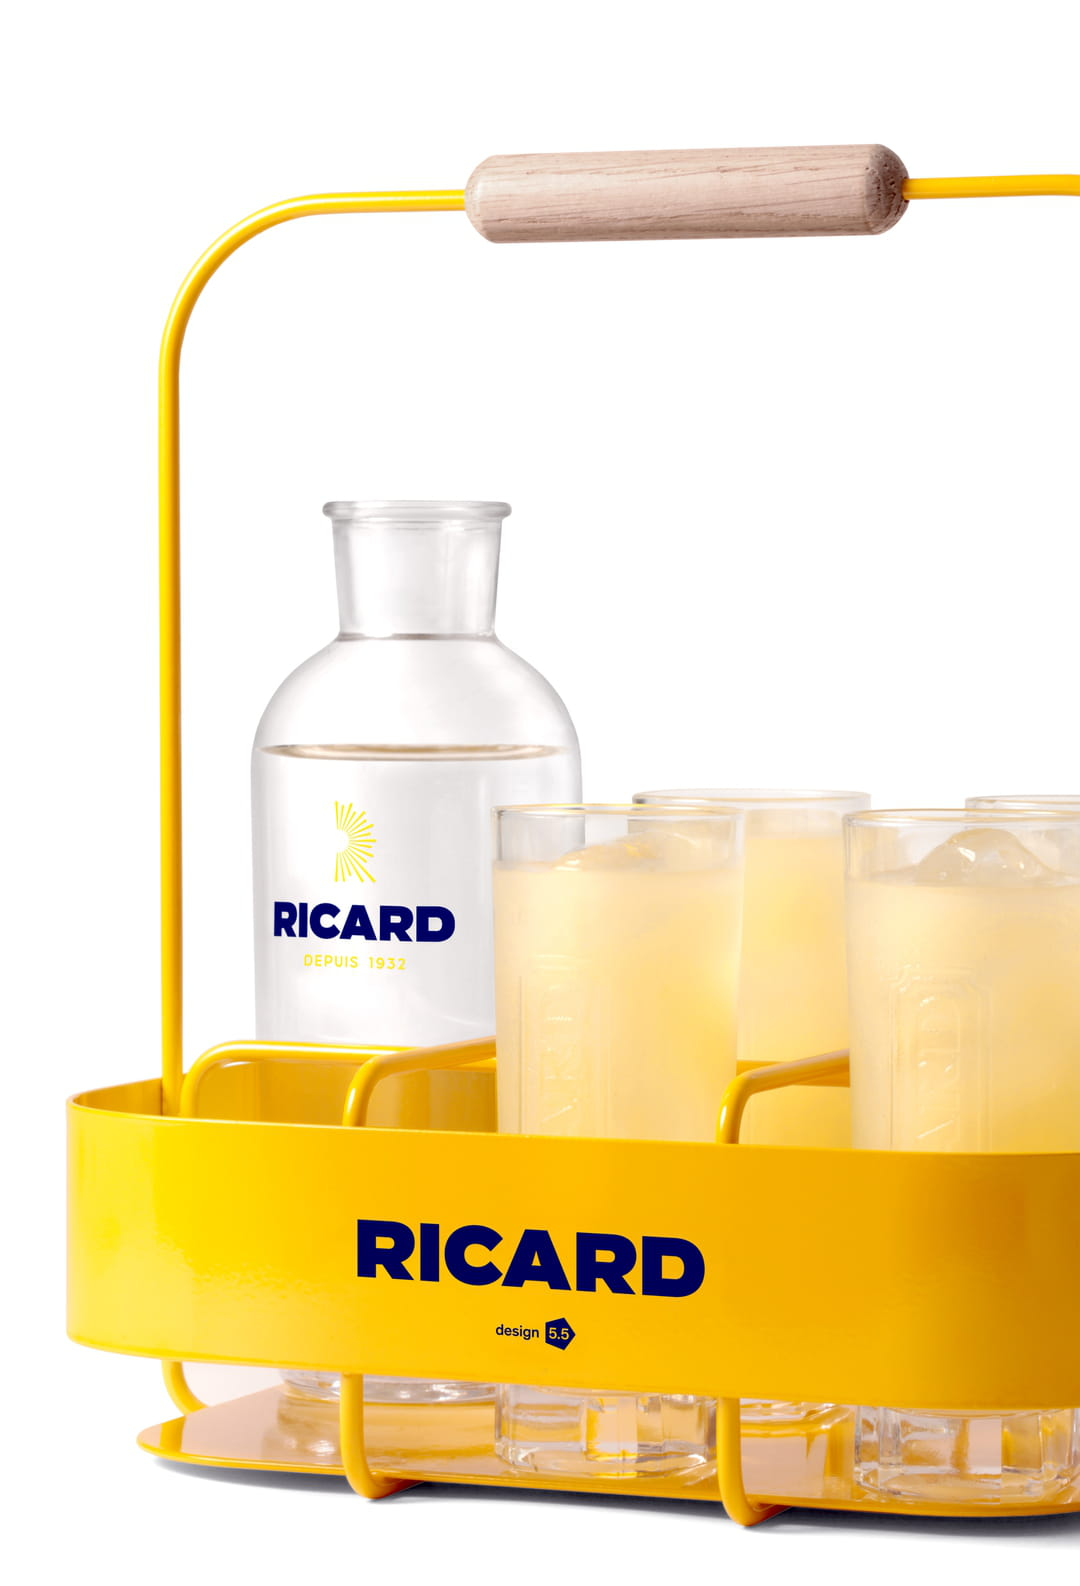 panier-ricard-5-5design-studio